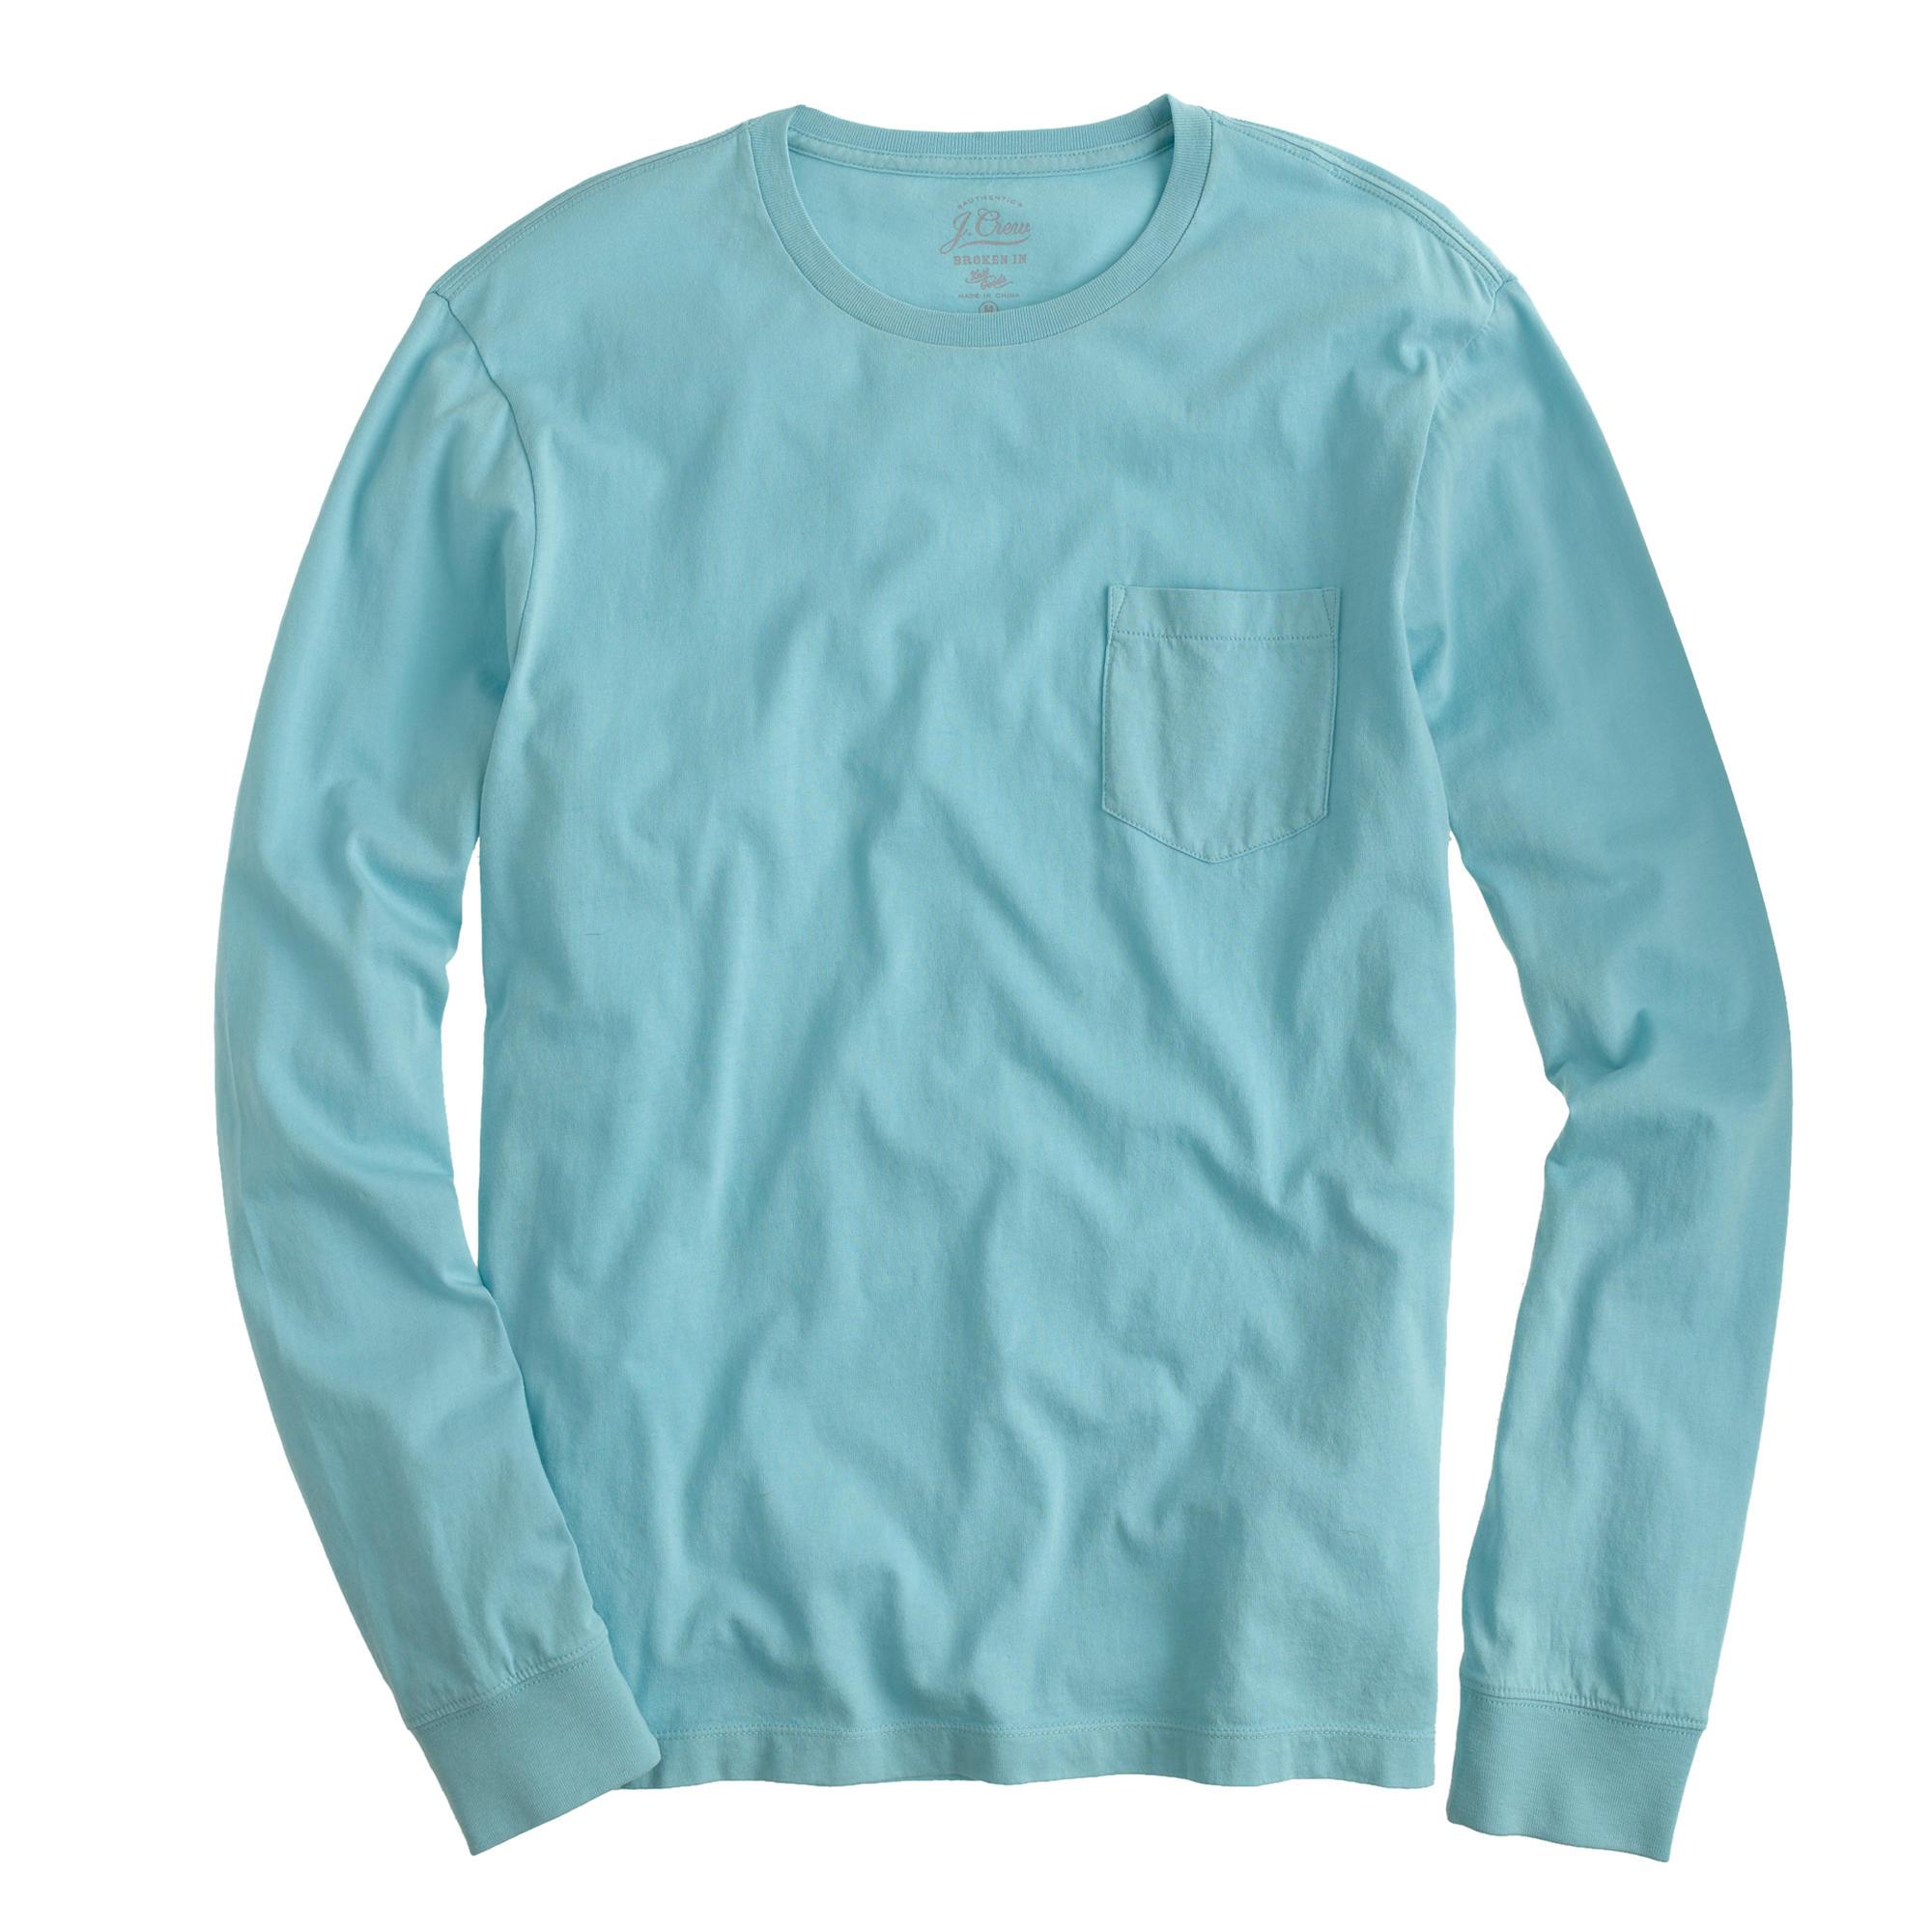 bfff66da27bf Lyst - J.Crew Broken-in Long-sleeve Pocket T-shirt in Blue for Men